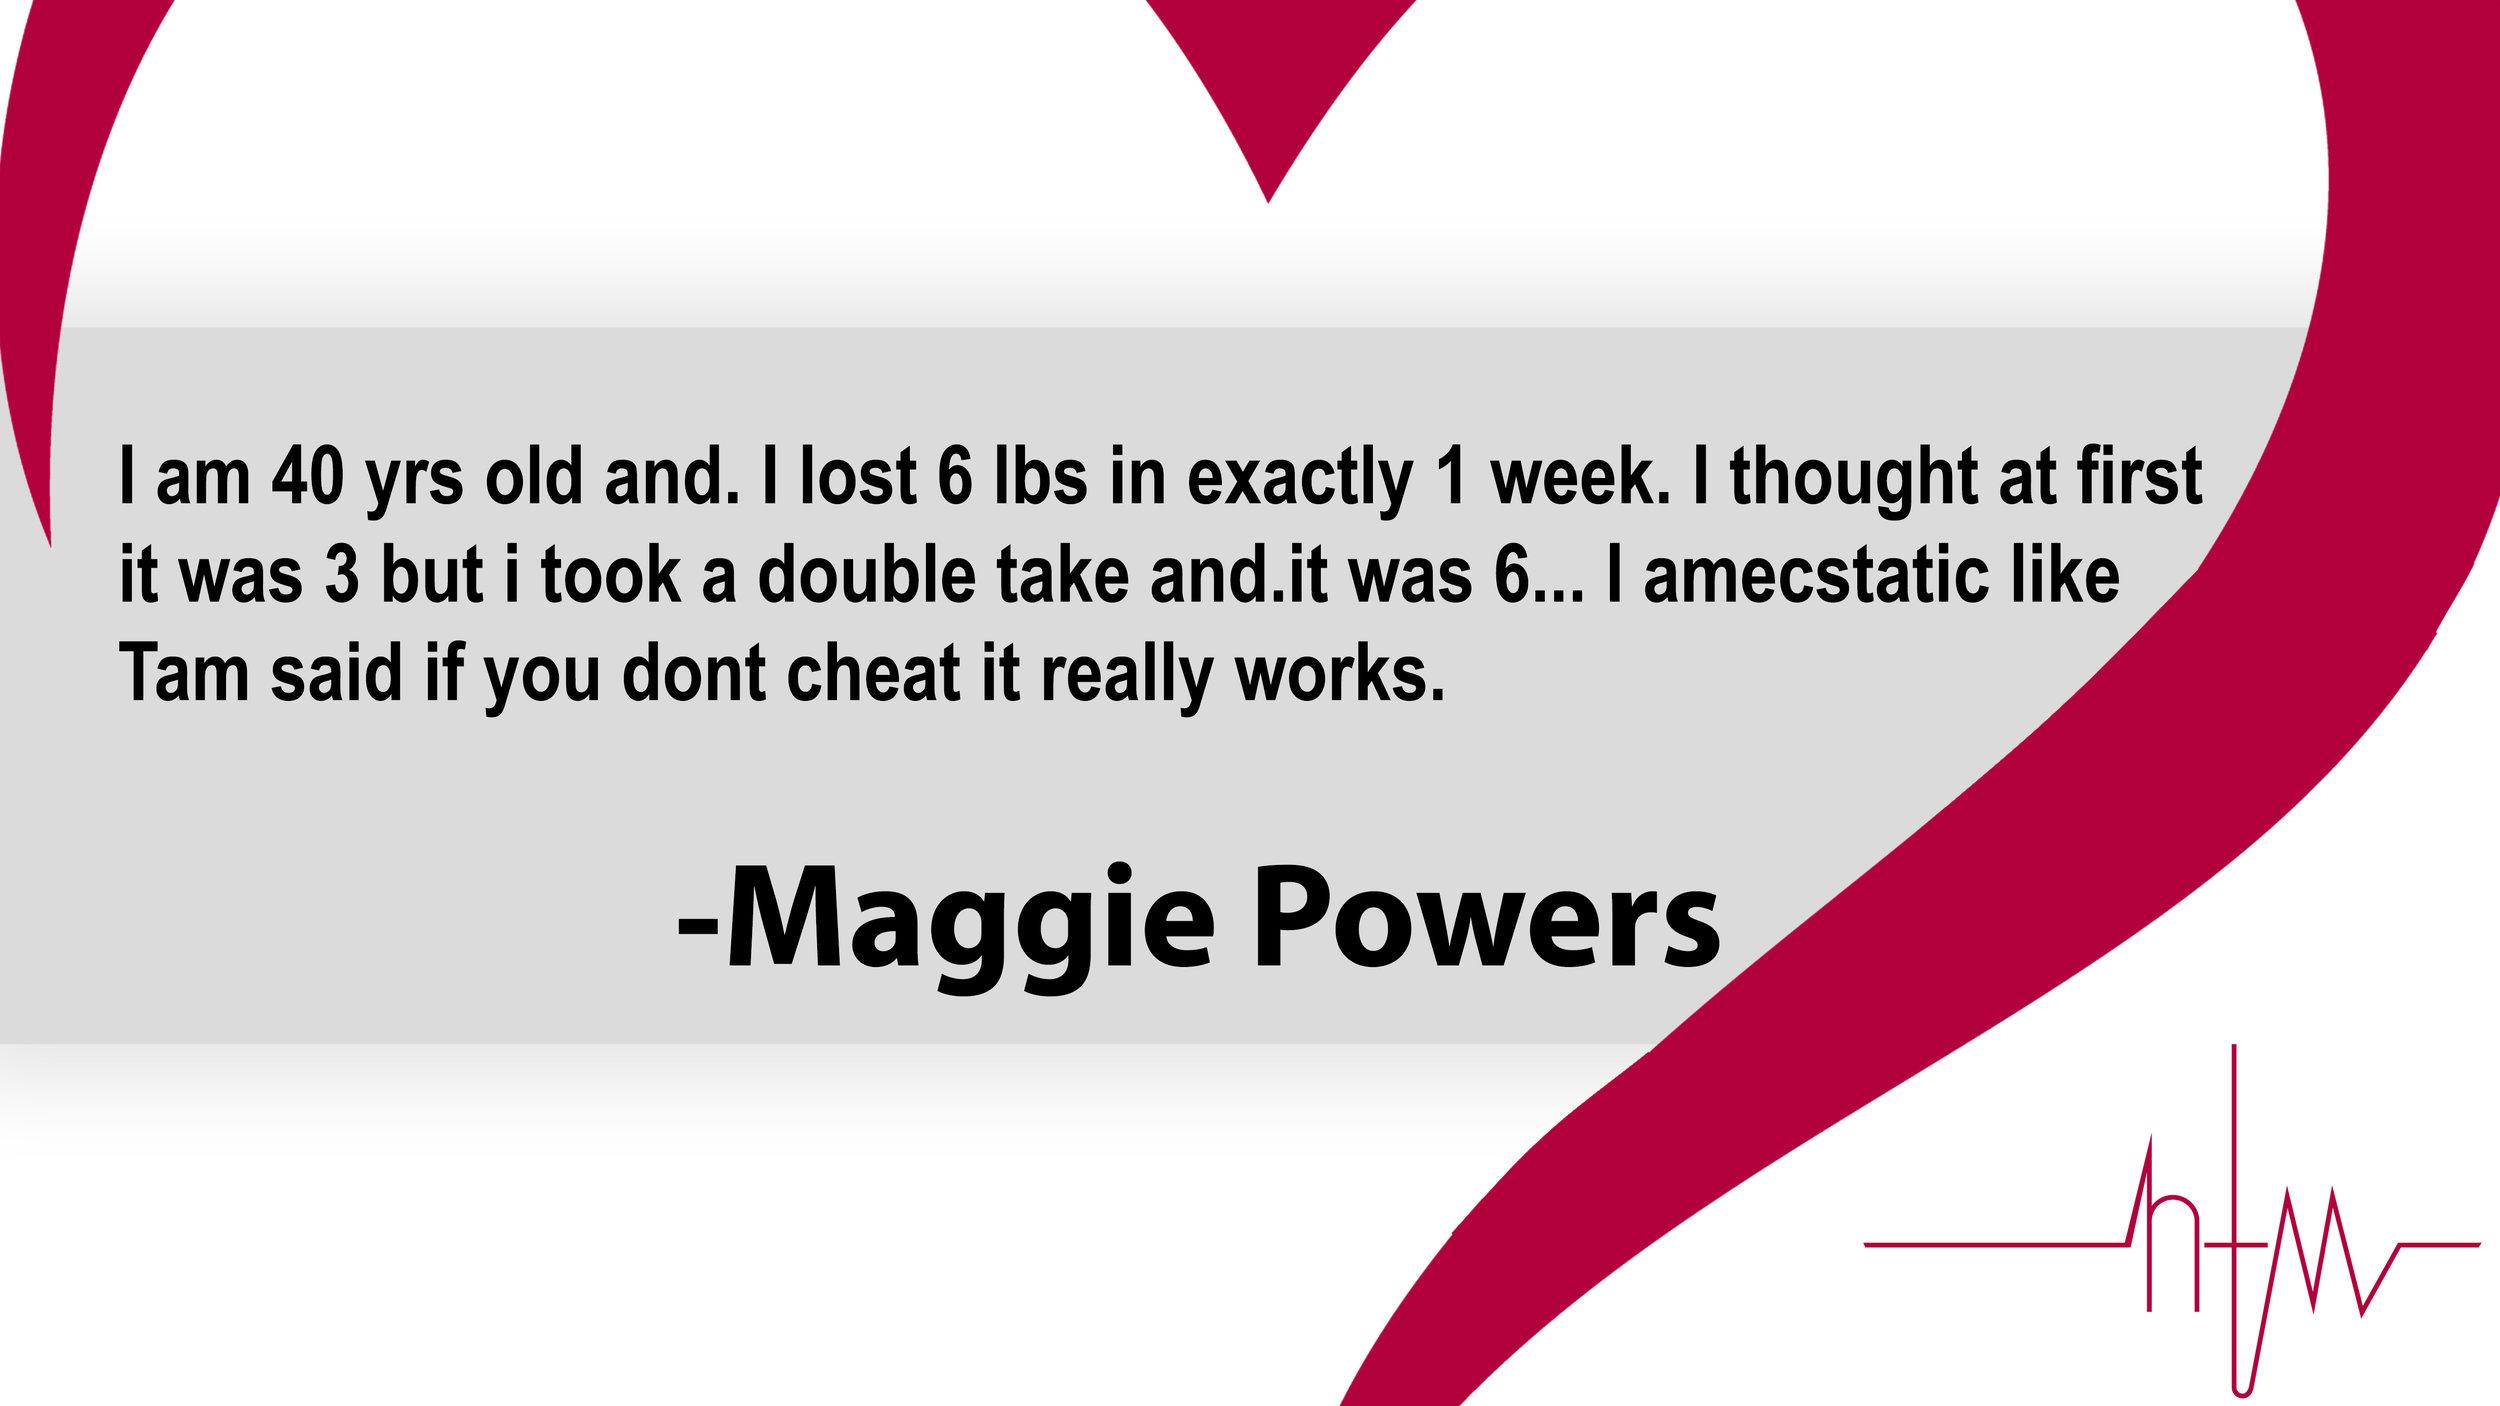 Maggie_Powers_Testimony.jpg